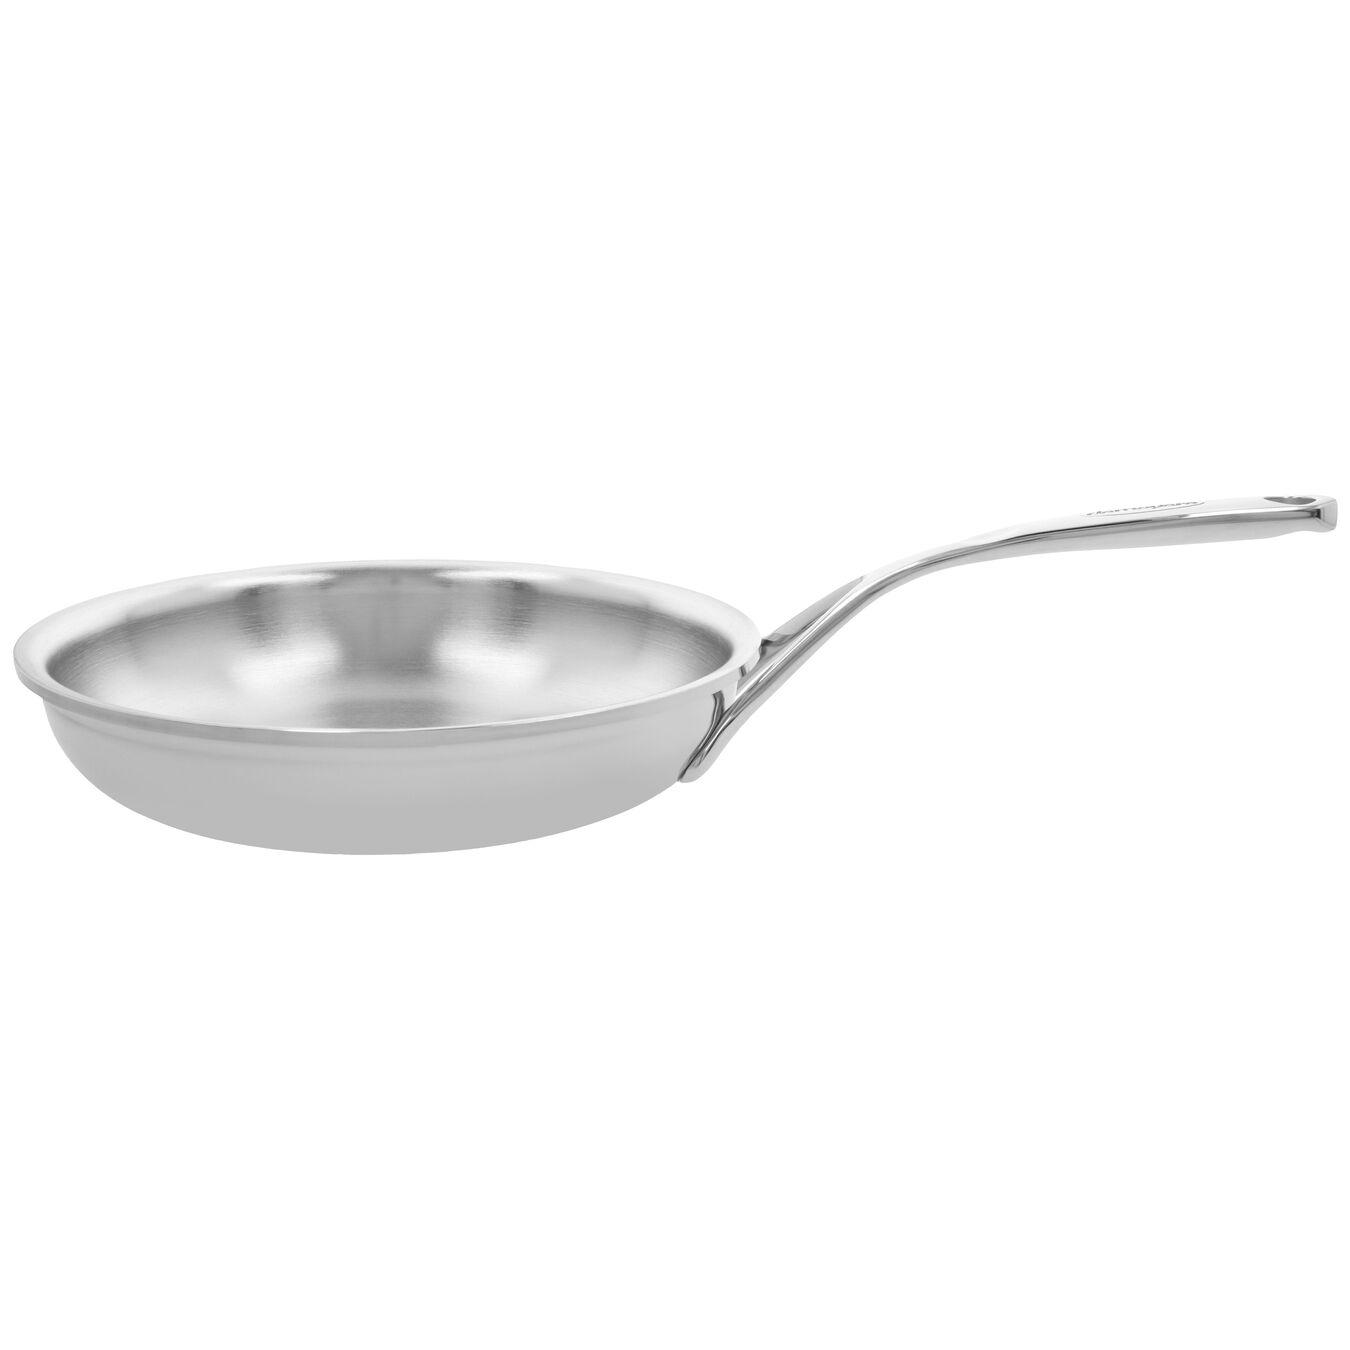 24 cm / 9 inch Frying pan,,large 1